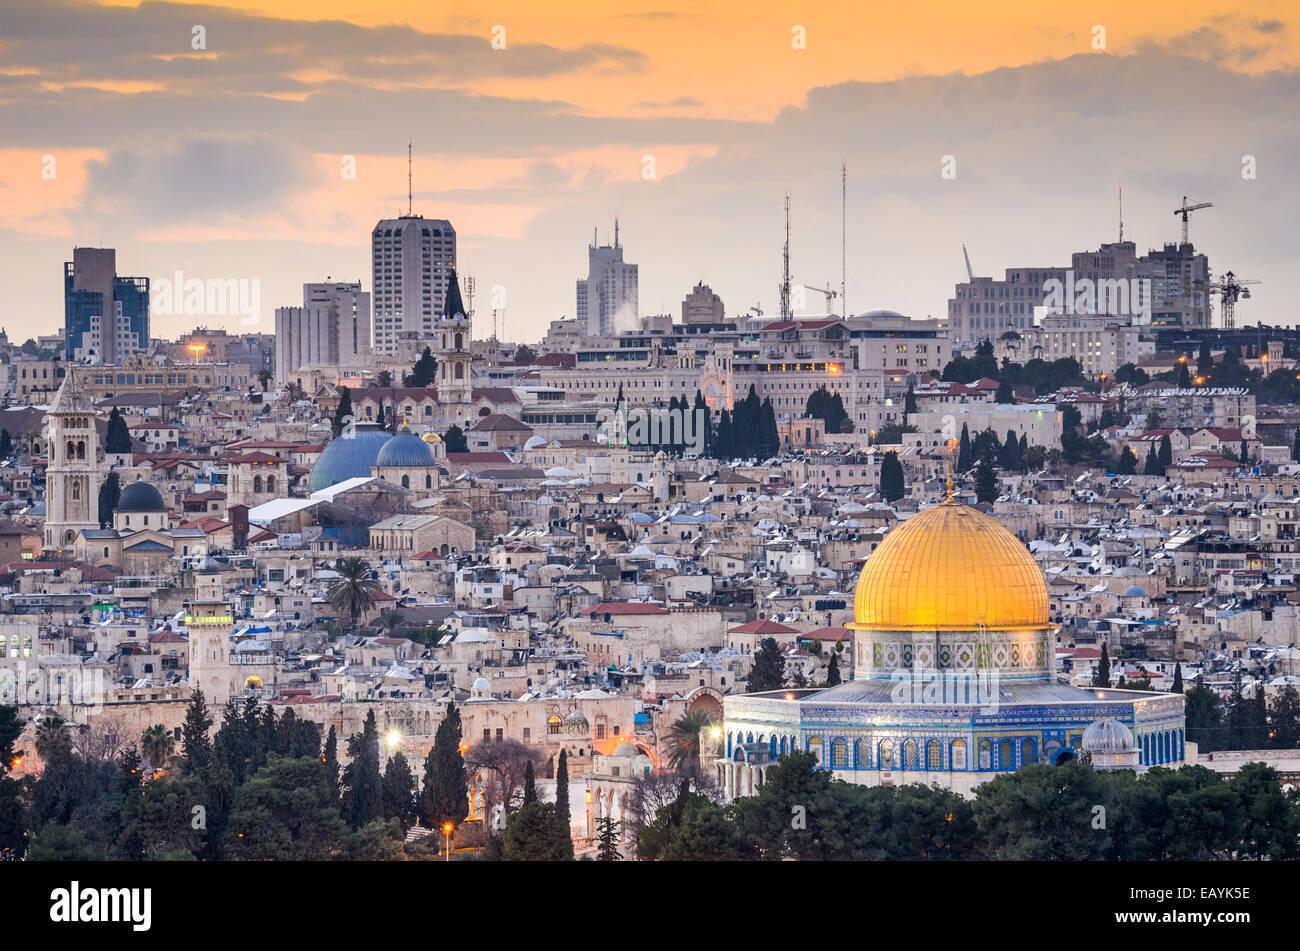 Jerusalén, Israel antiguo panorama de la ciudád. Imagen De Stock